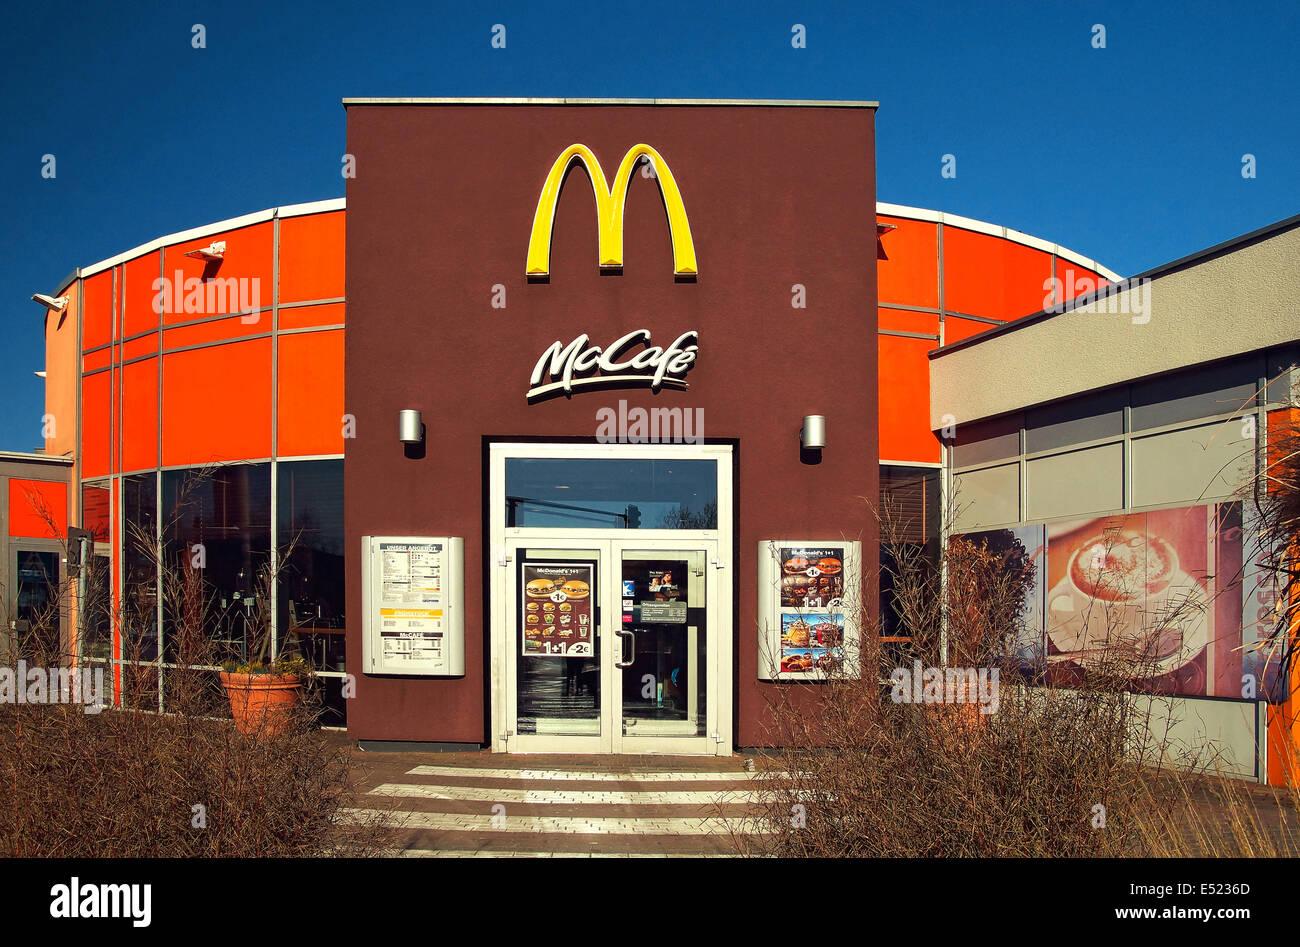 McDonalds subsidiary - Stock Image